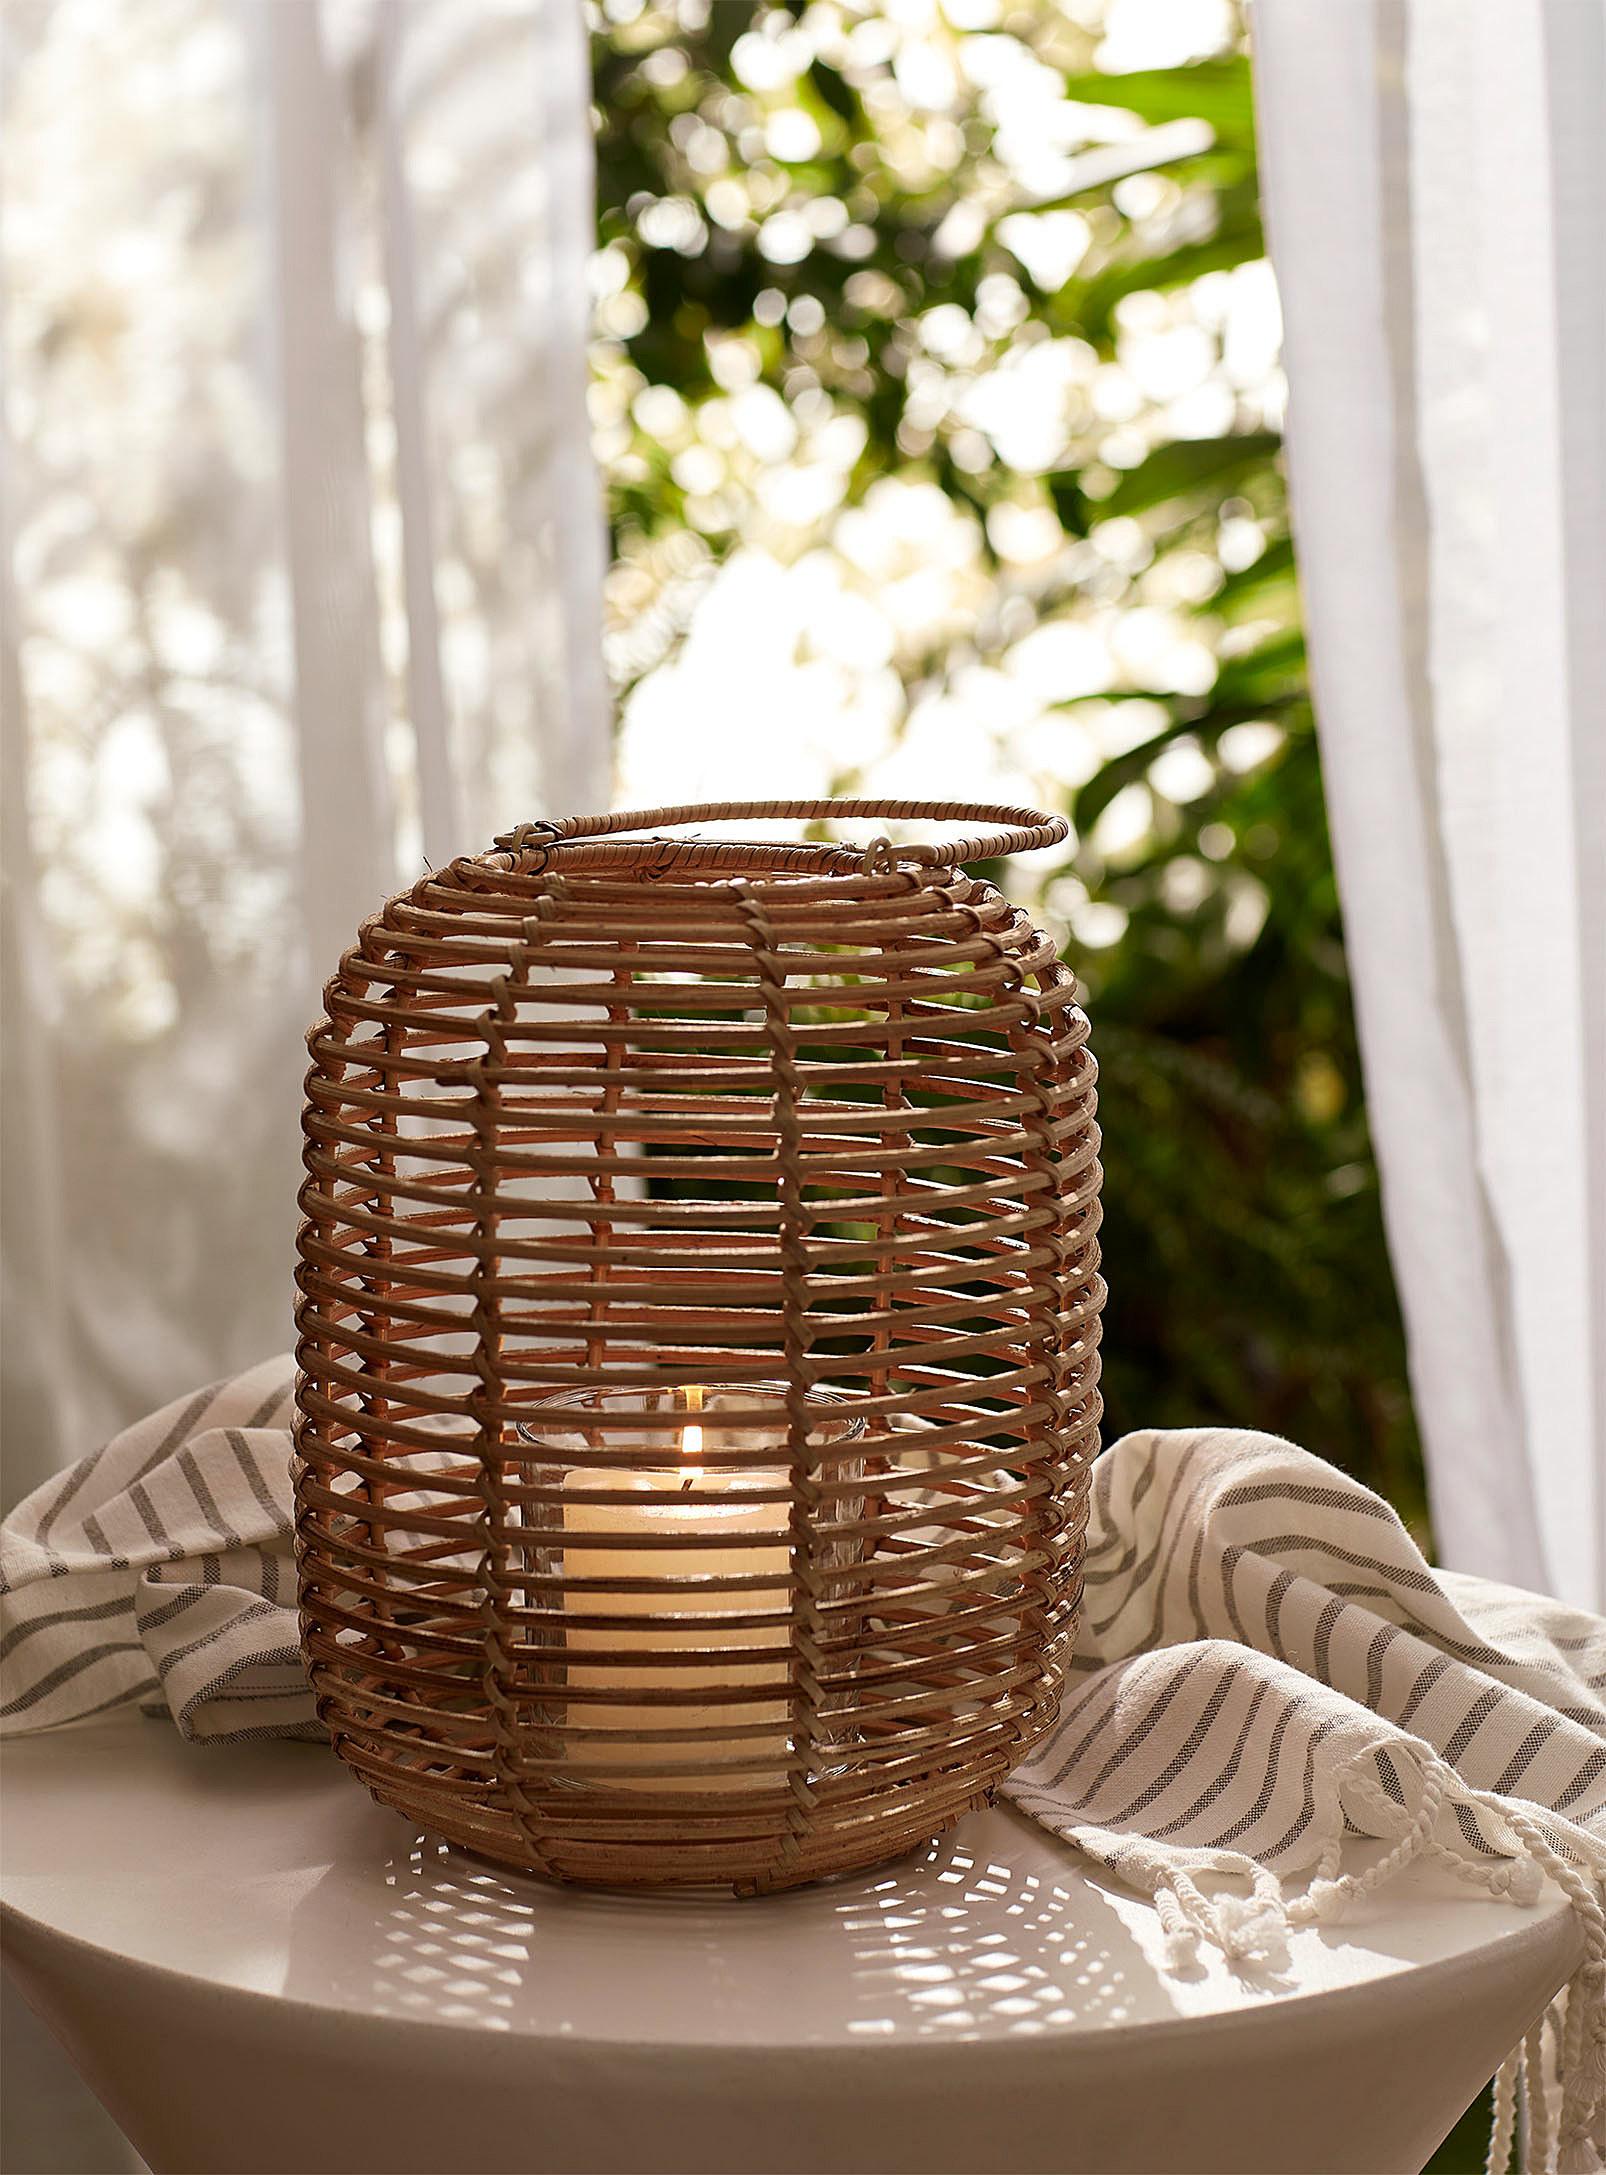 A burning candle inside a rattan lantern